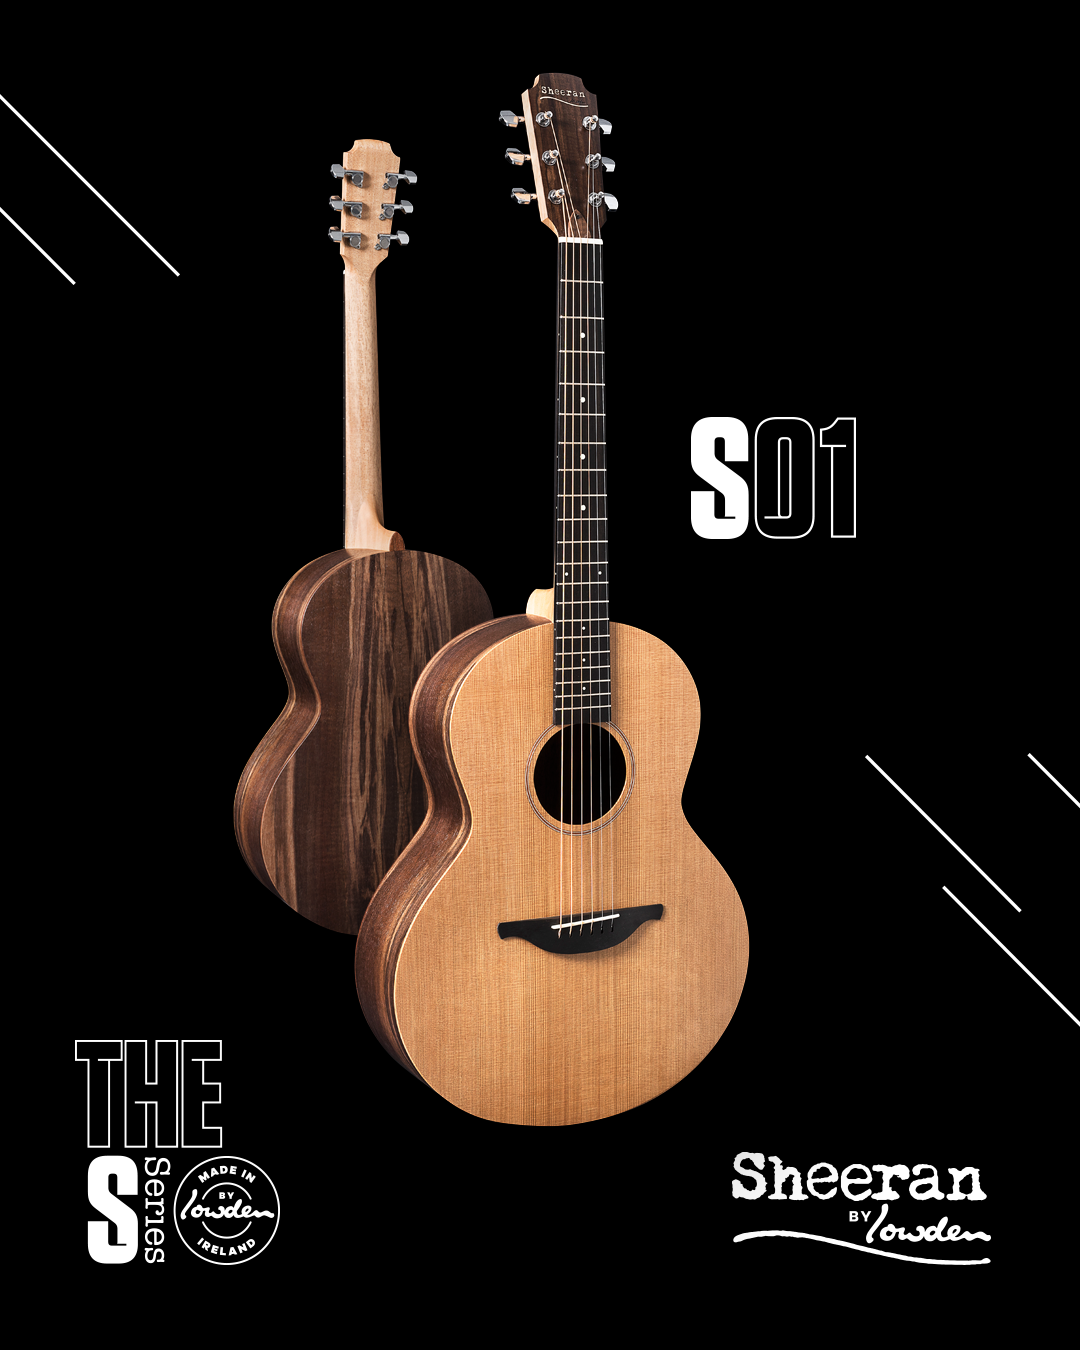 Sheeran S01